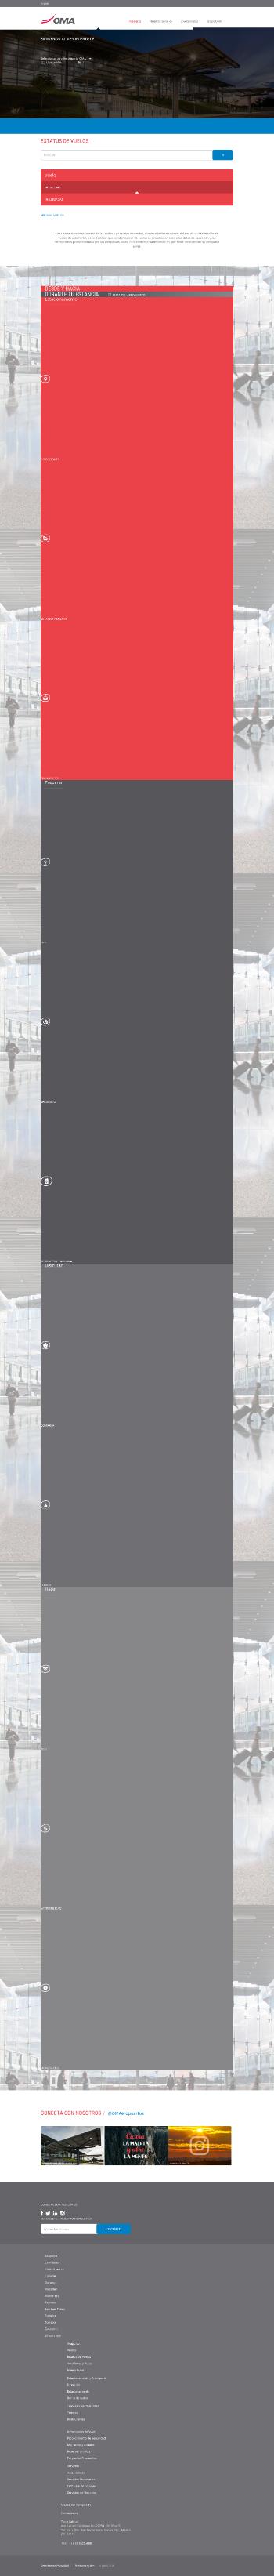 Grupo Aeroportuario del Centro Norte, S.A.B. de C.V. Website Screenshot